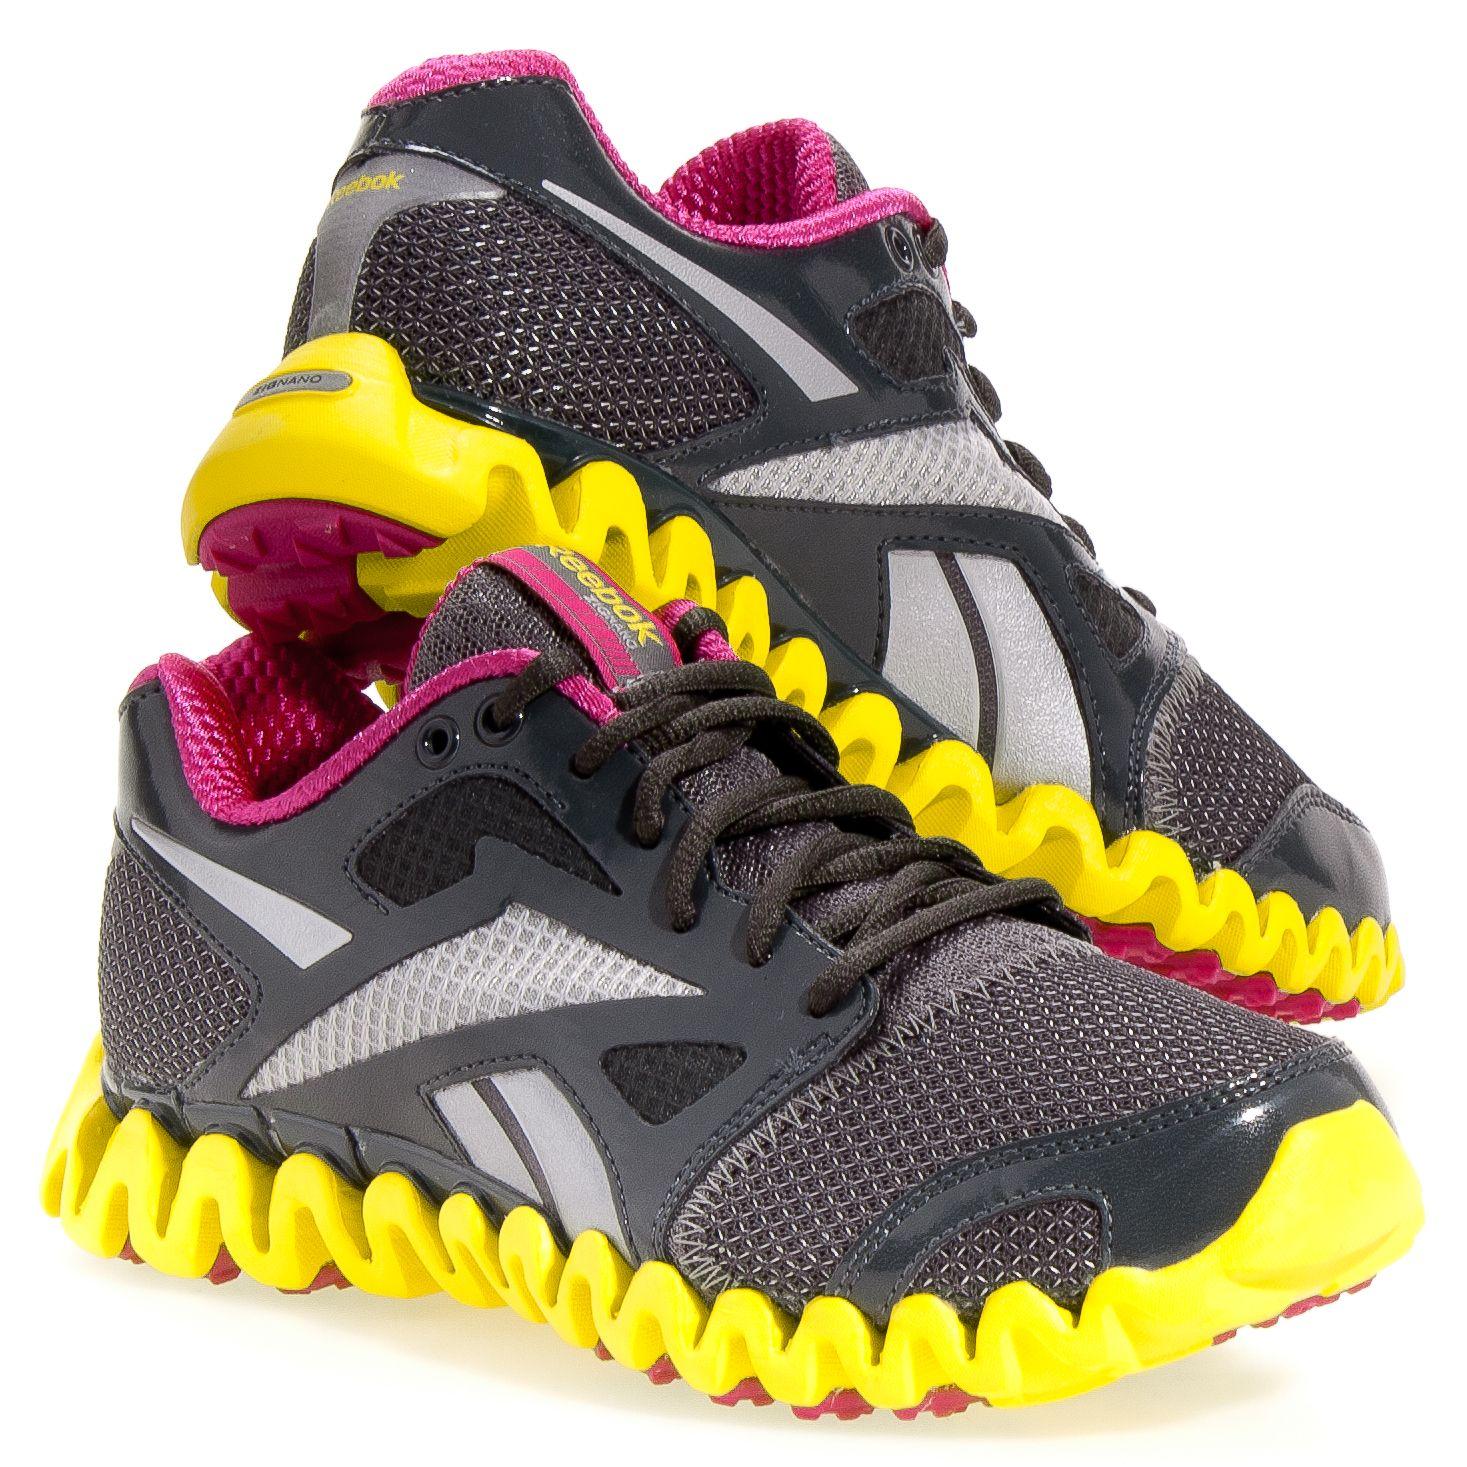 ea47674dc0fa Reebok Zignano Fly 2 Women s Running Shoes  Grey 10